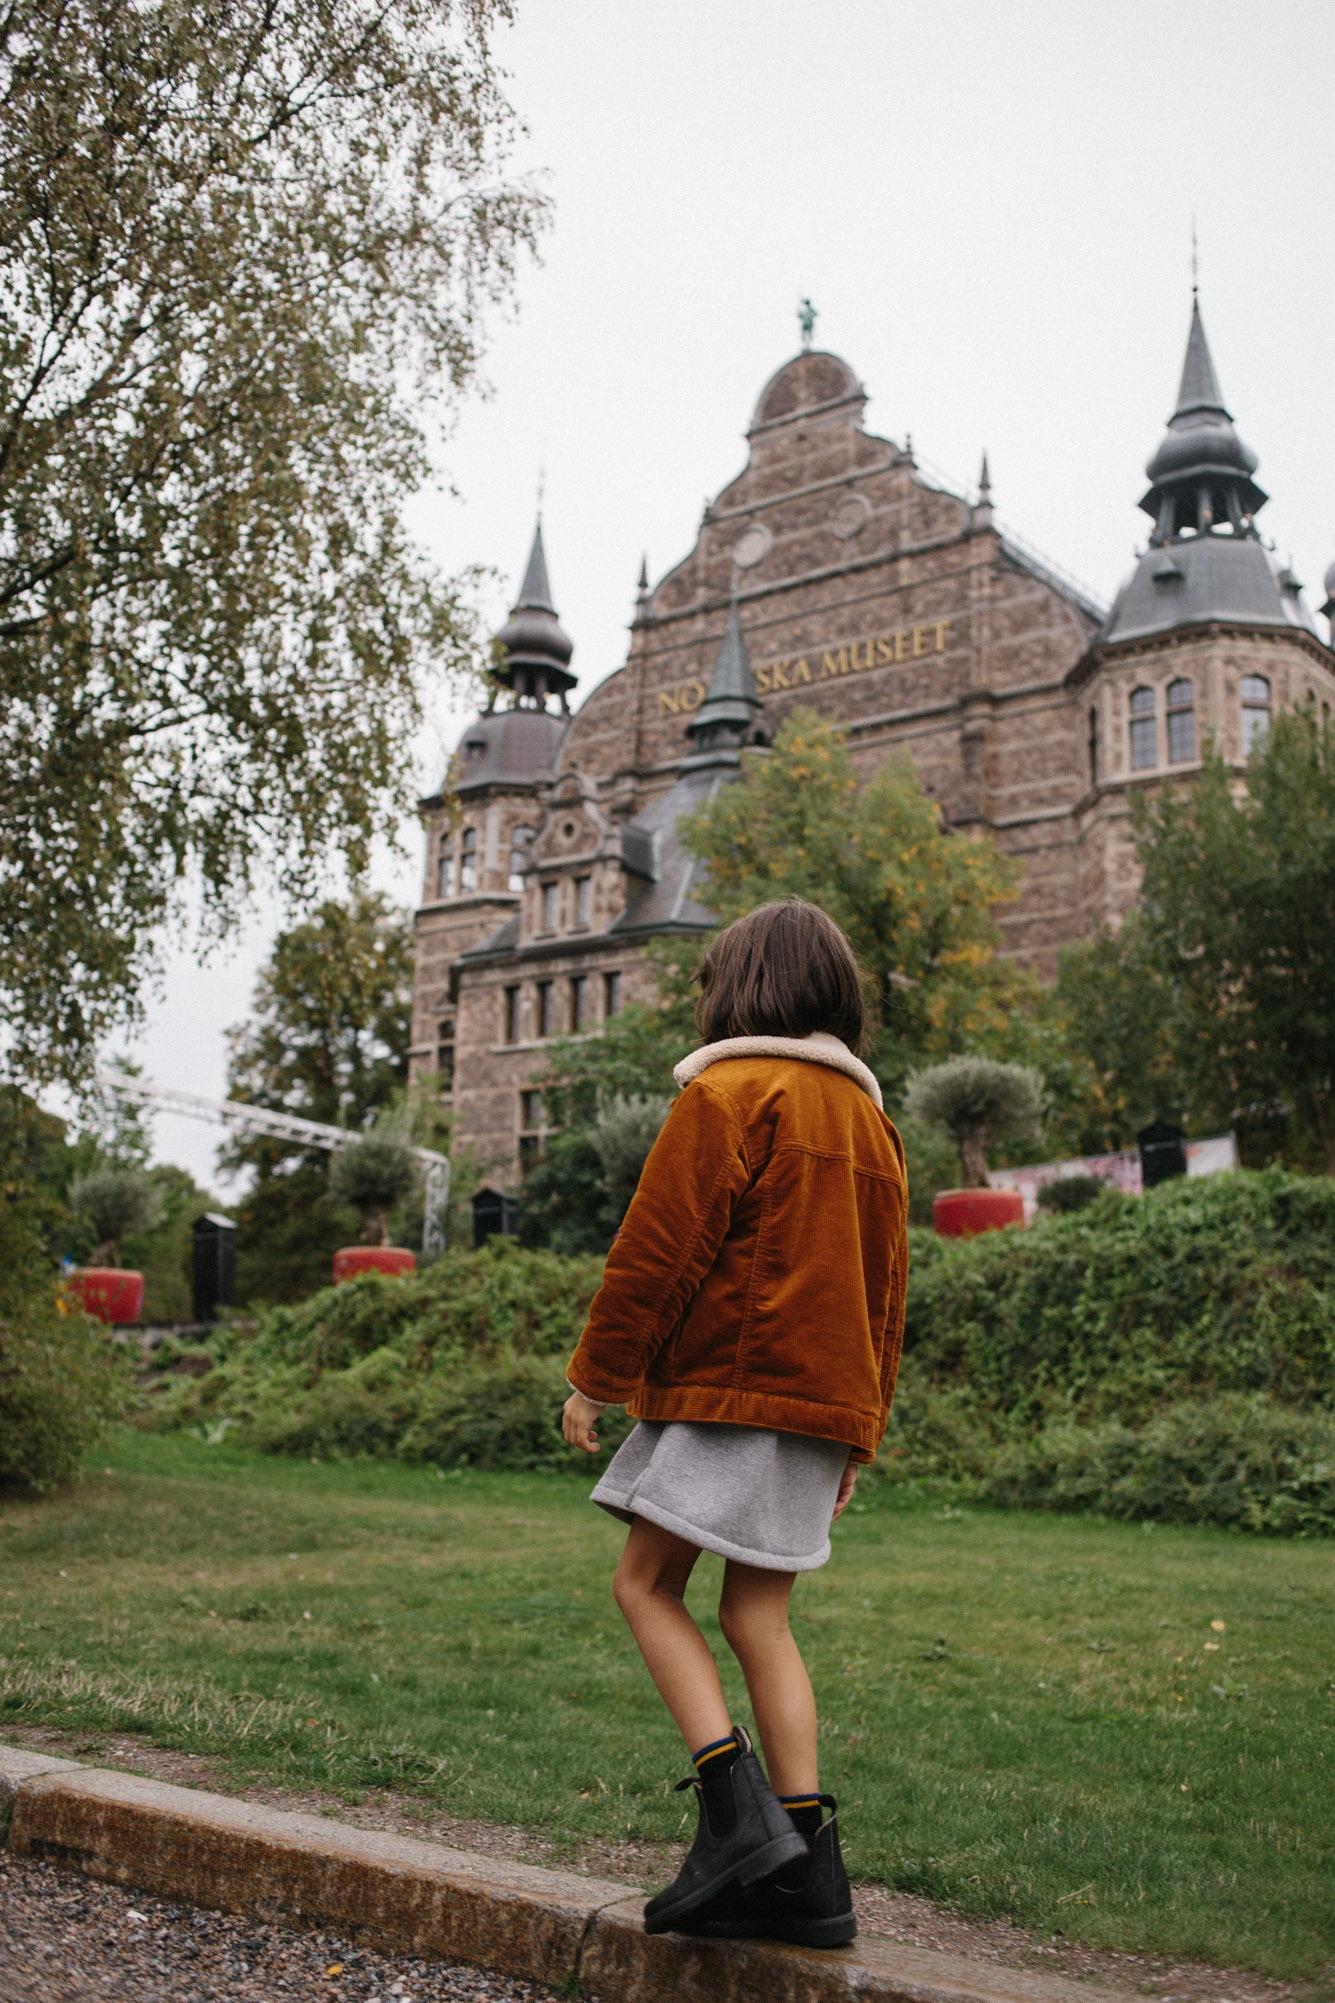 stockholm-kids-cityguide-conbotasdeagua-30.jpg